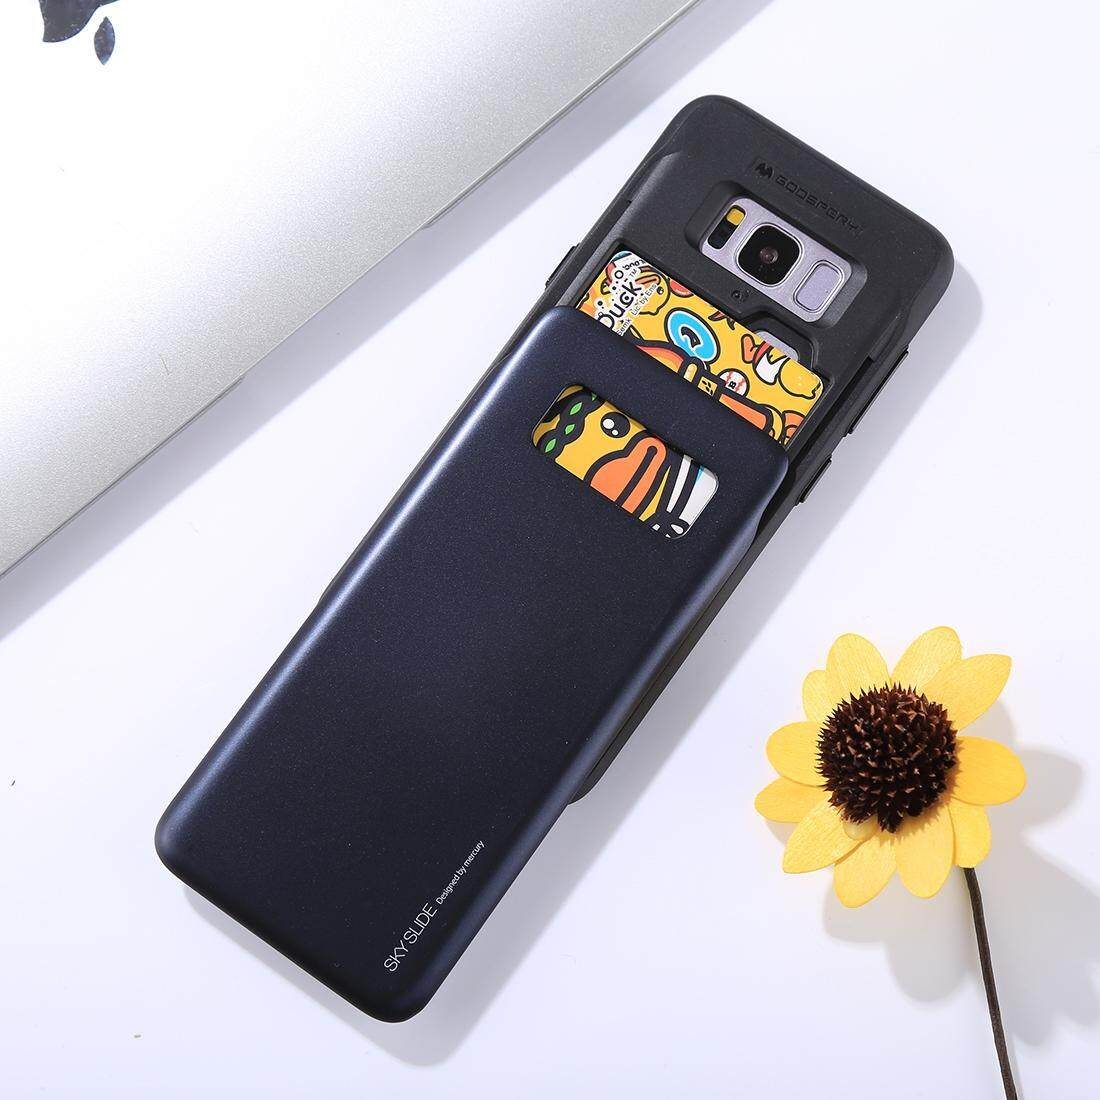 Jual Murah Goospery Samsung Galaxy S8 Plus New Bumper X Case Black Soft Feeling Jelly Features Mercury For G950 Tpu Pc Sky